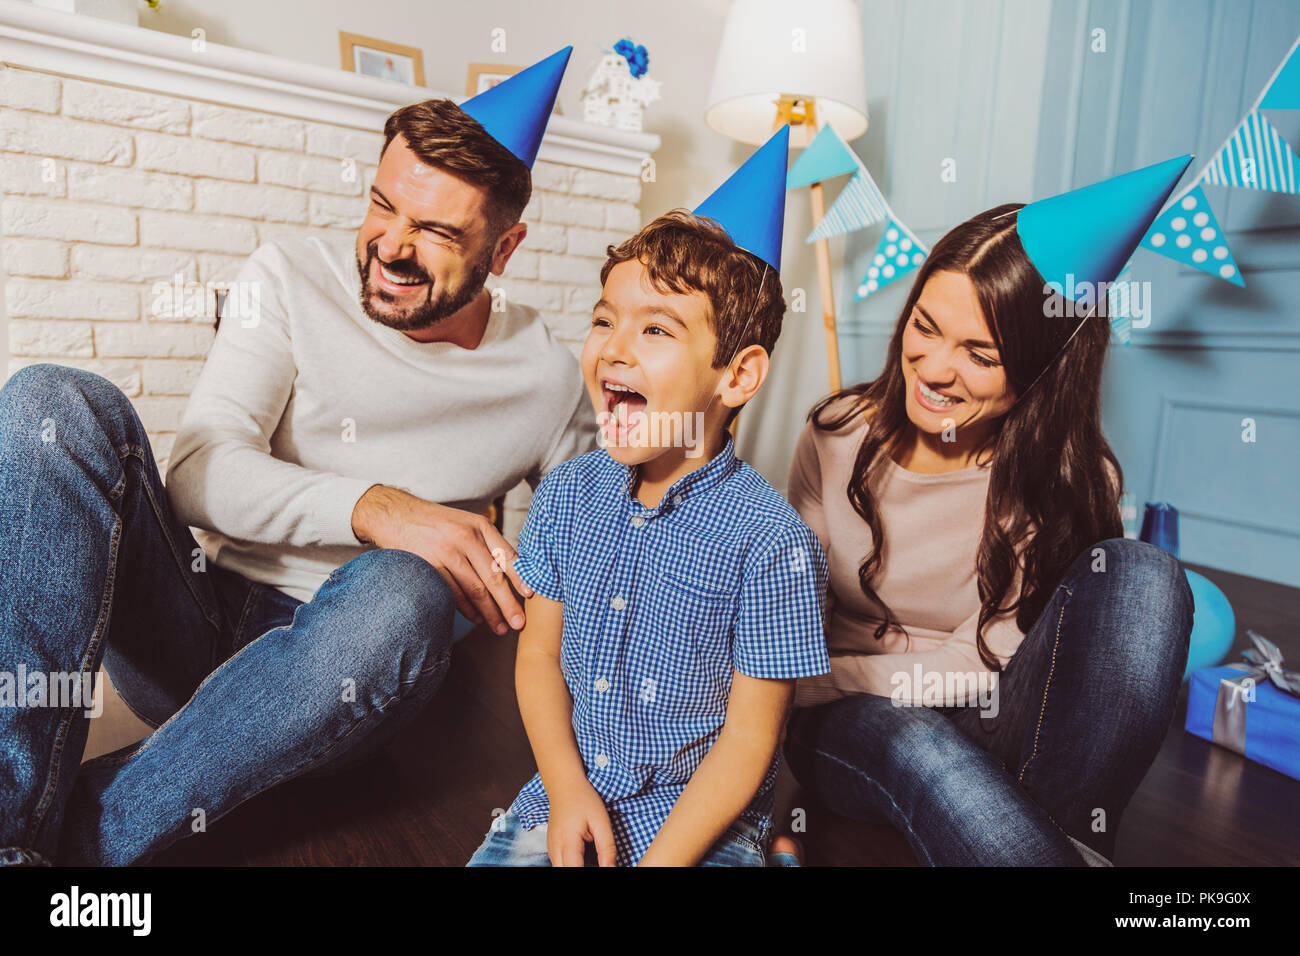 Feliz cumpleaños feliz familia regocijo Imagen De Stock